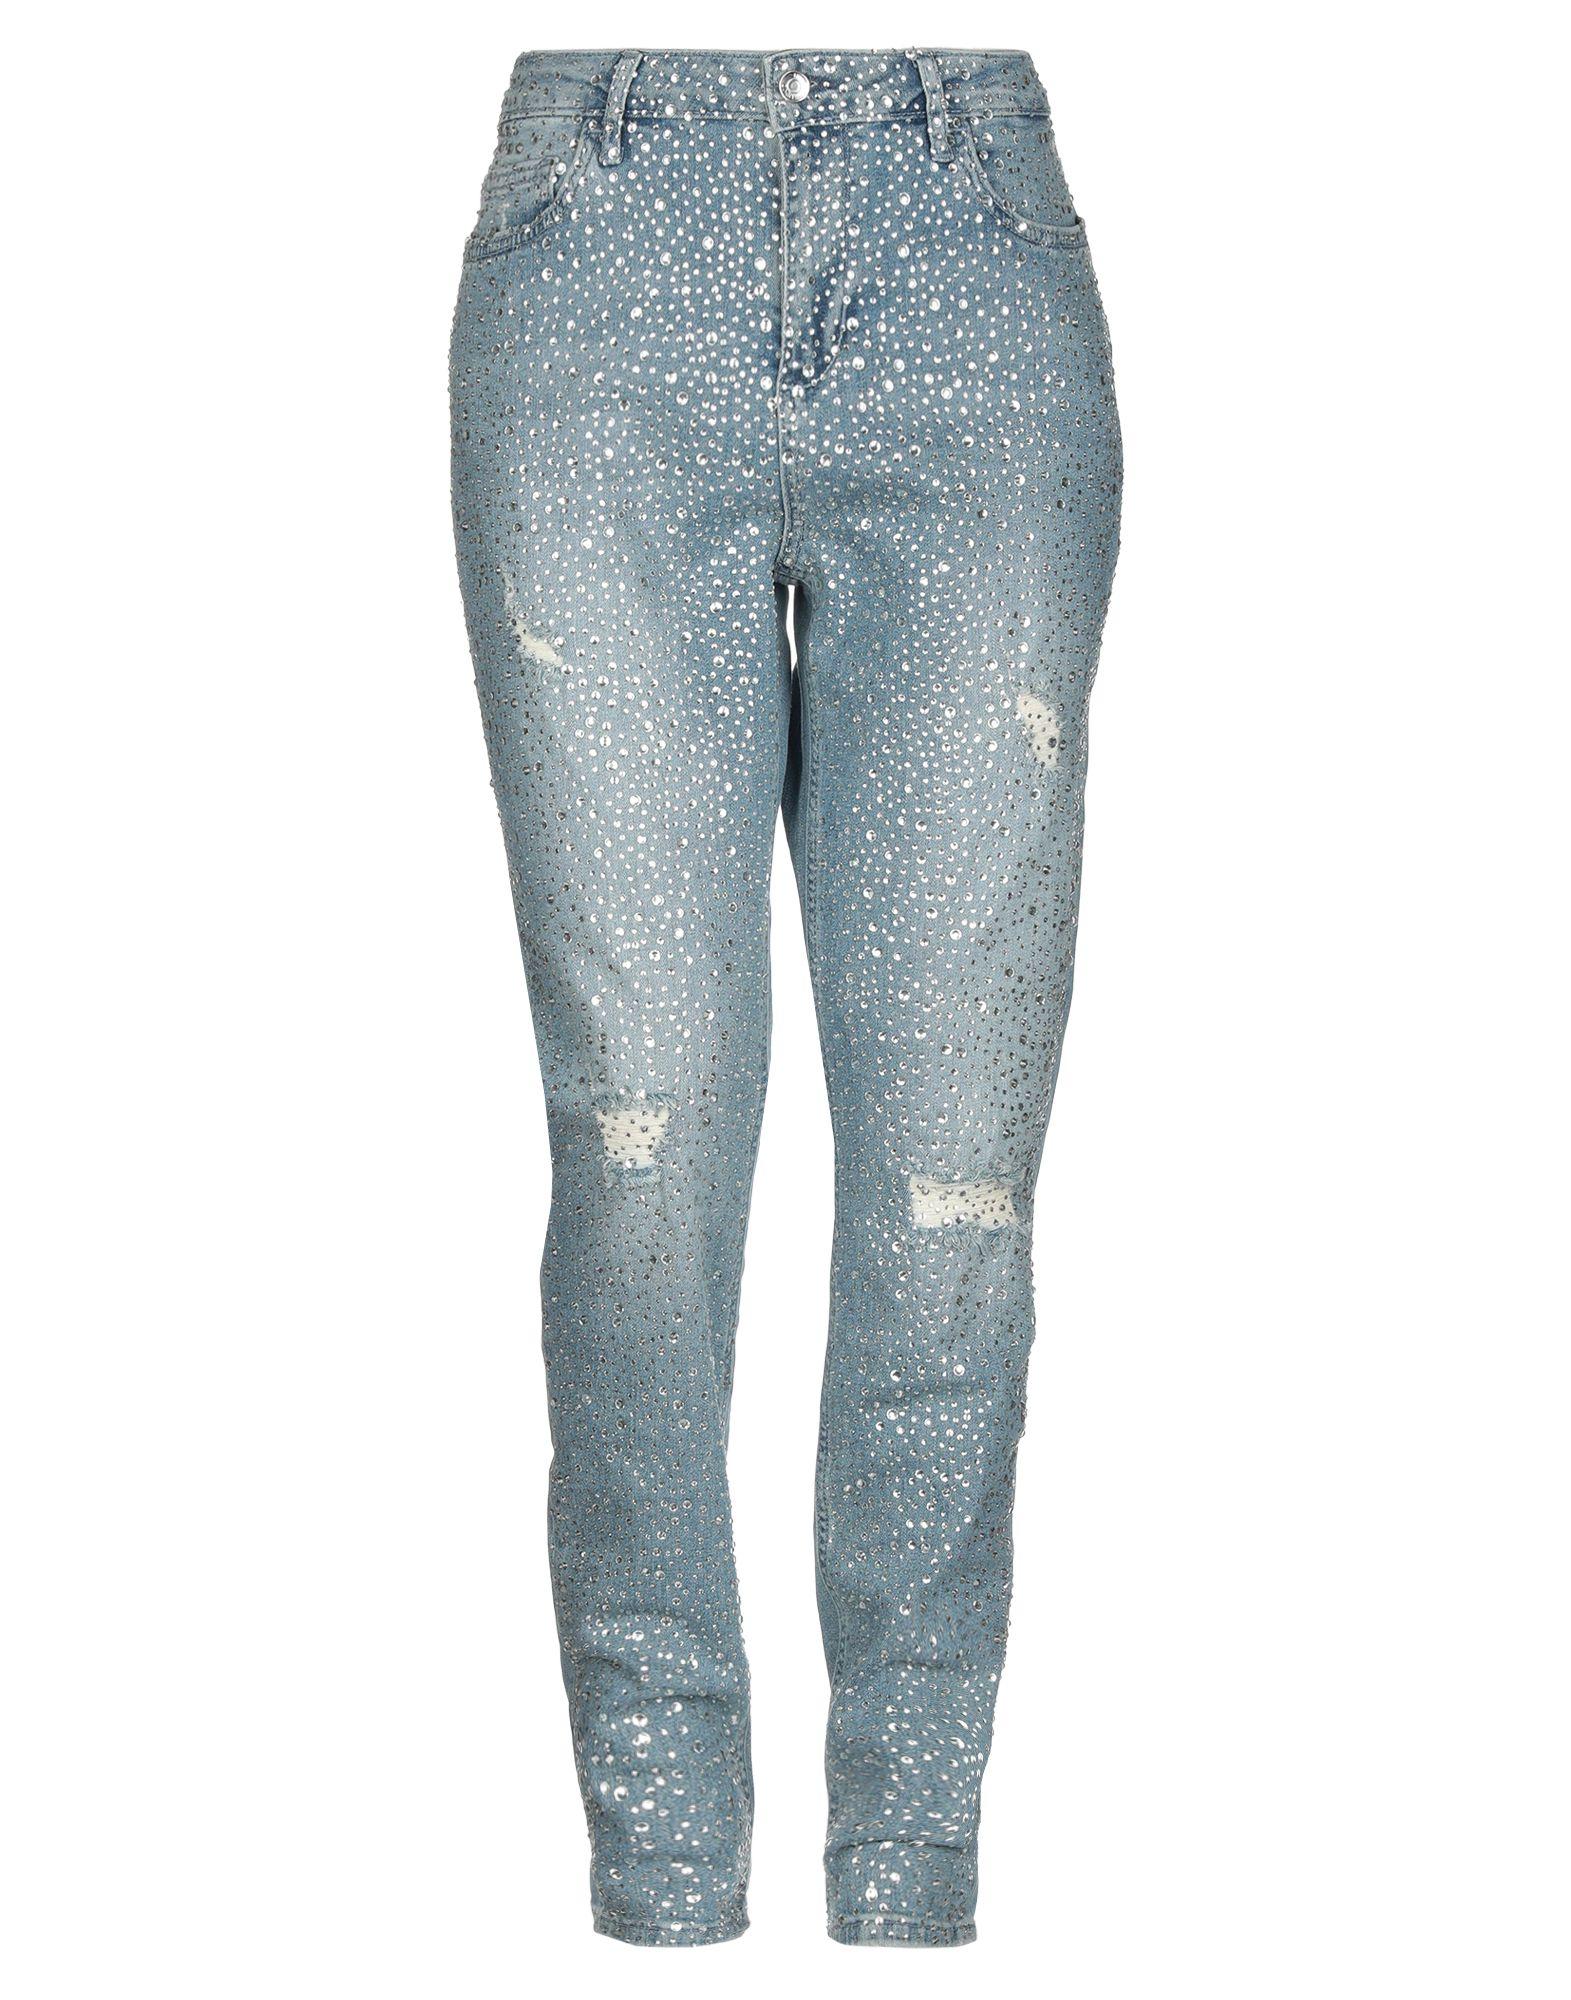 LIU JO Denim pants - Item 42781445